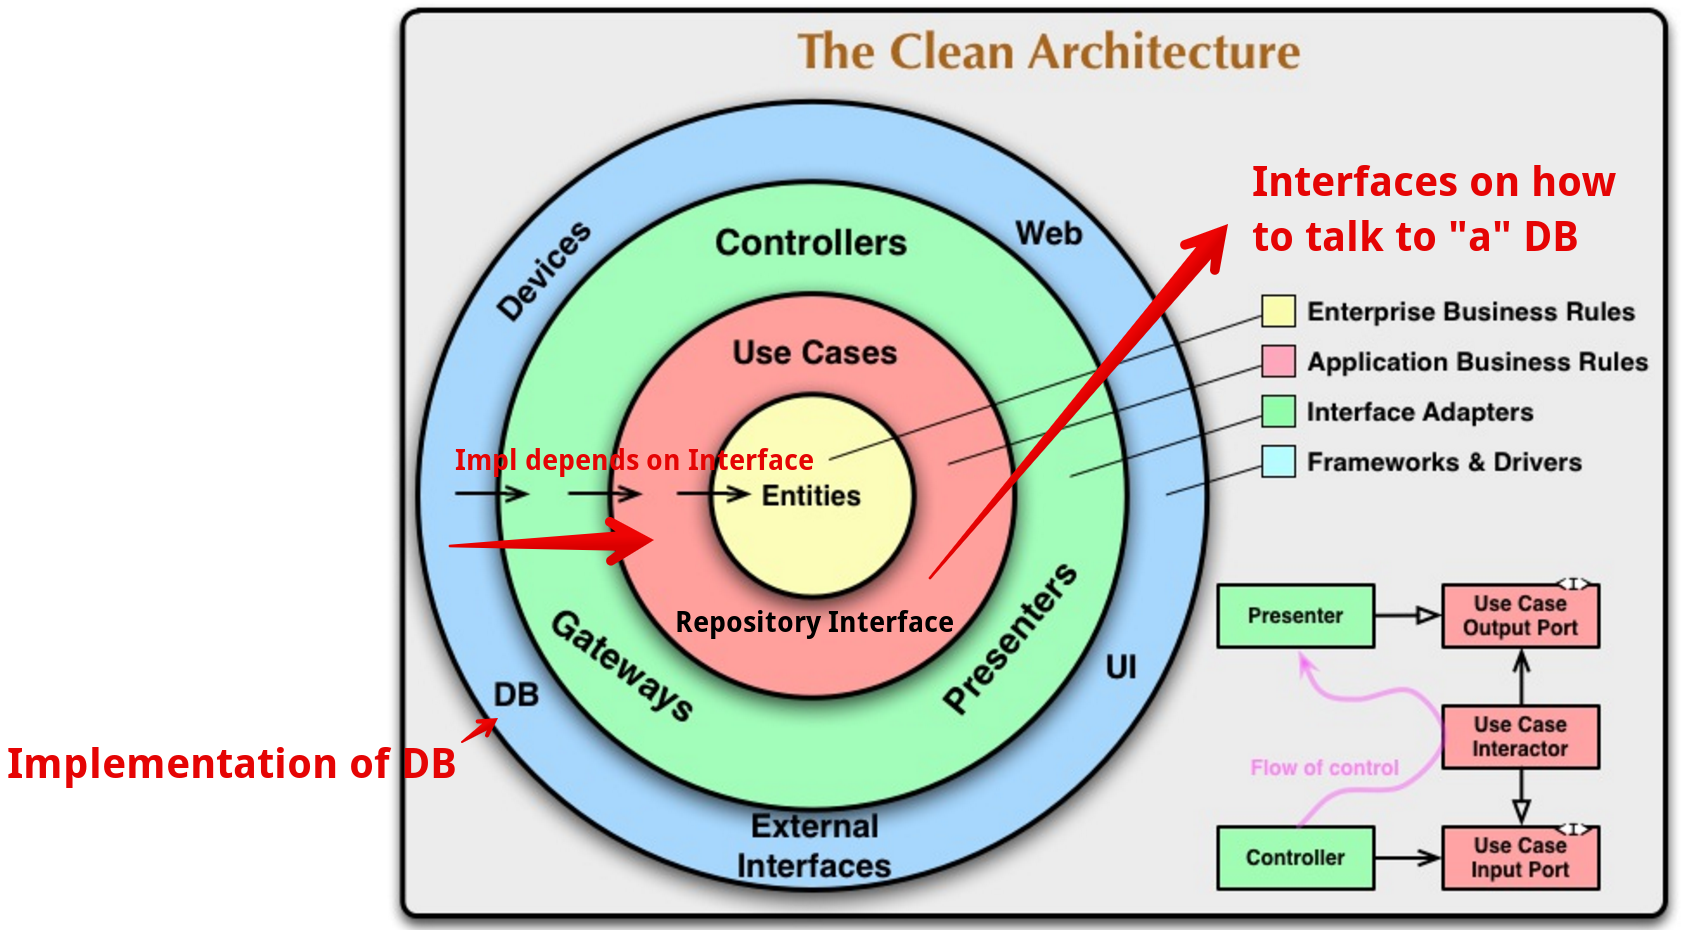 An implementation always depends on an interface